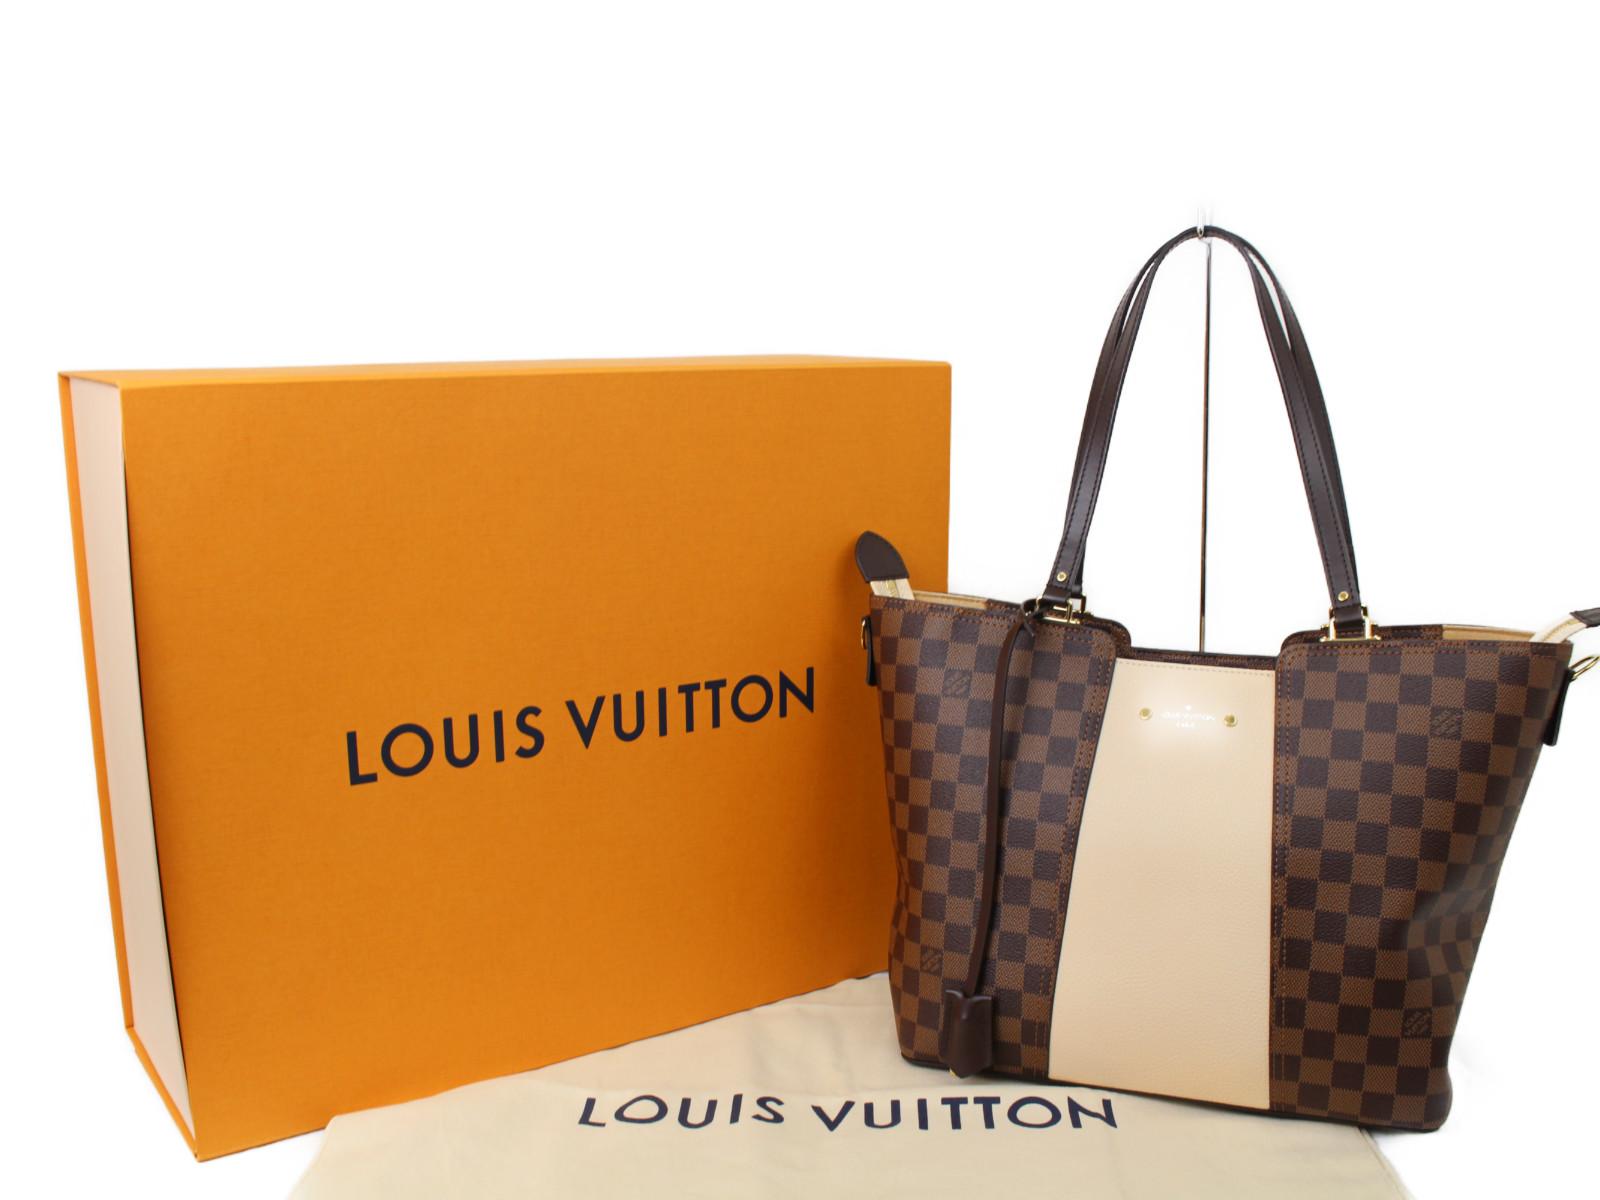 LOUIS VUITTON ルイヴィトン ジャージー N44022 レディース ストラップ付 プレゼント包装可 【中古】